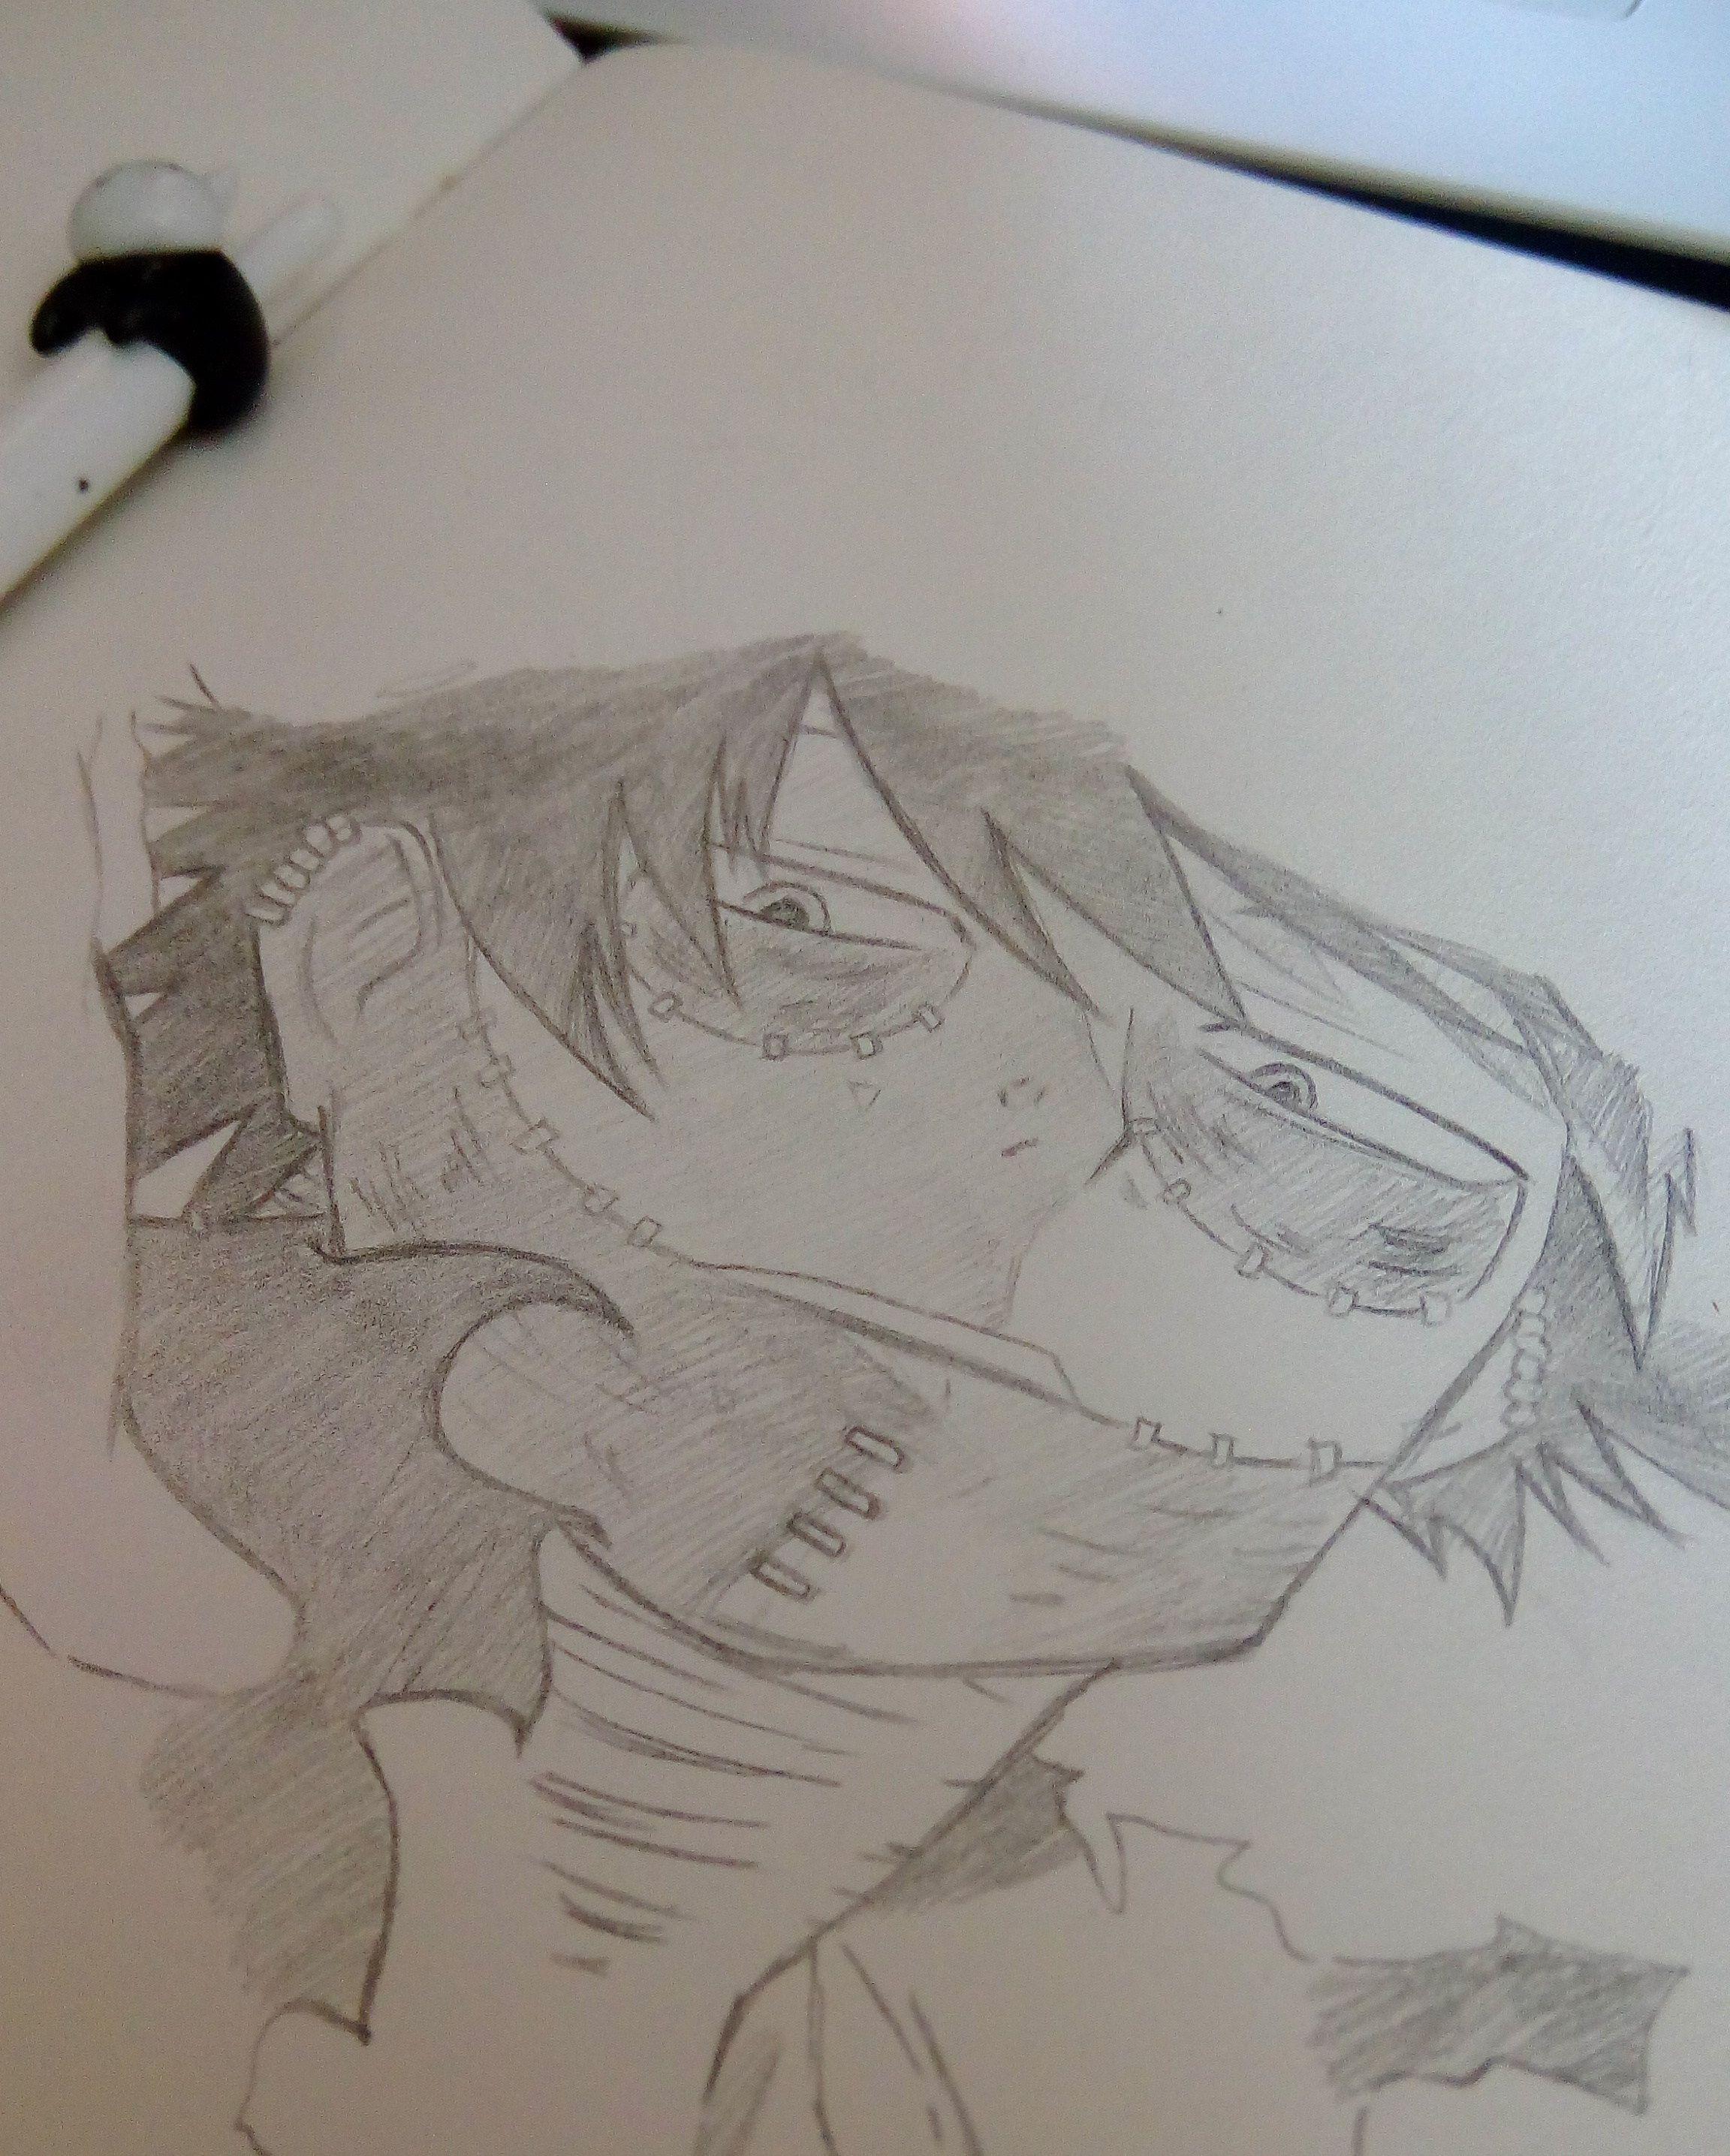 My Hero Academia Drawing Easy Pencil Drawingsketch101 Com In 2020 Easy Drawings My Hero My Hero Academia